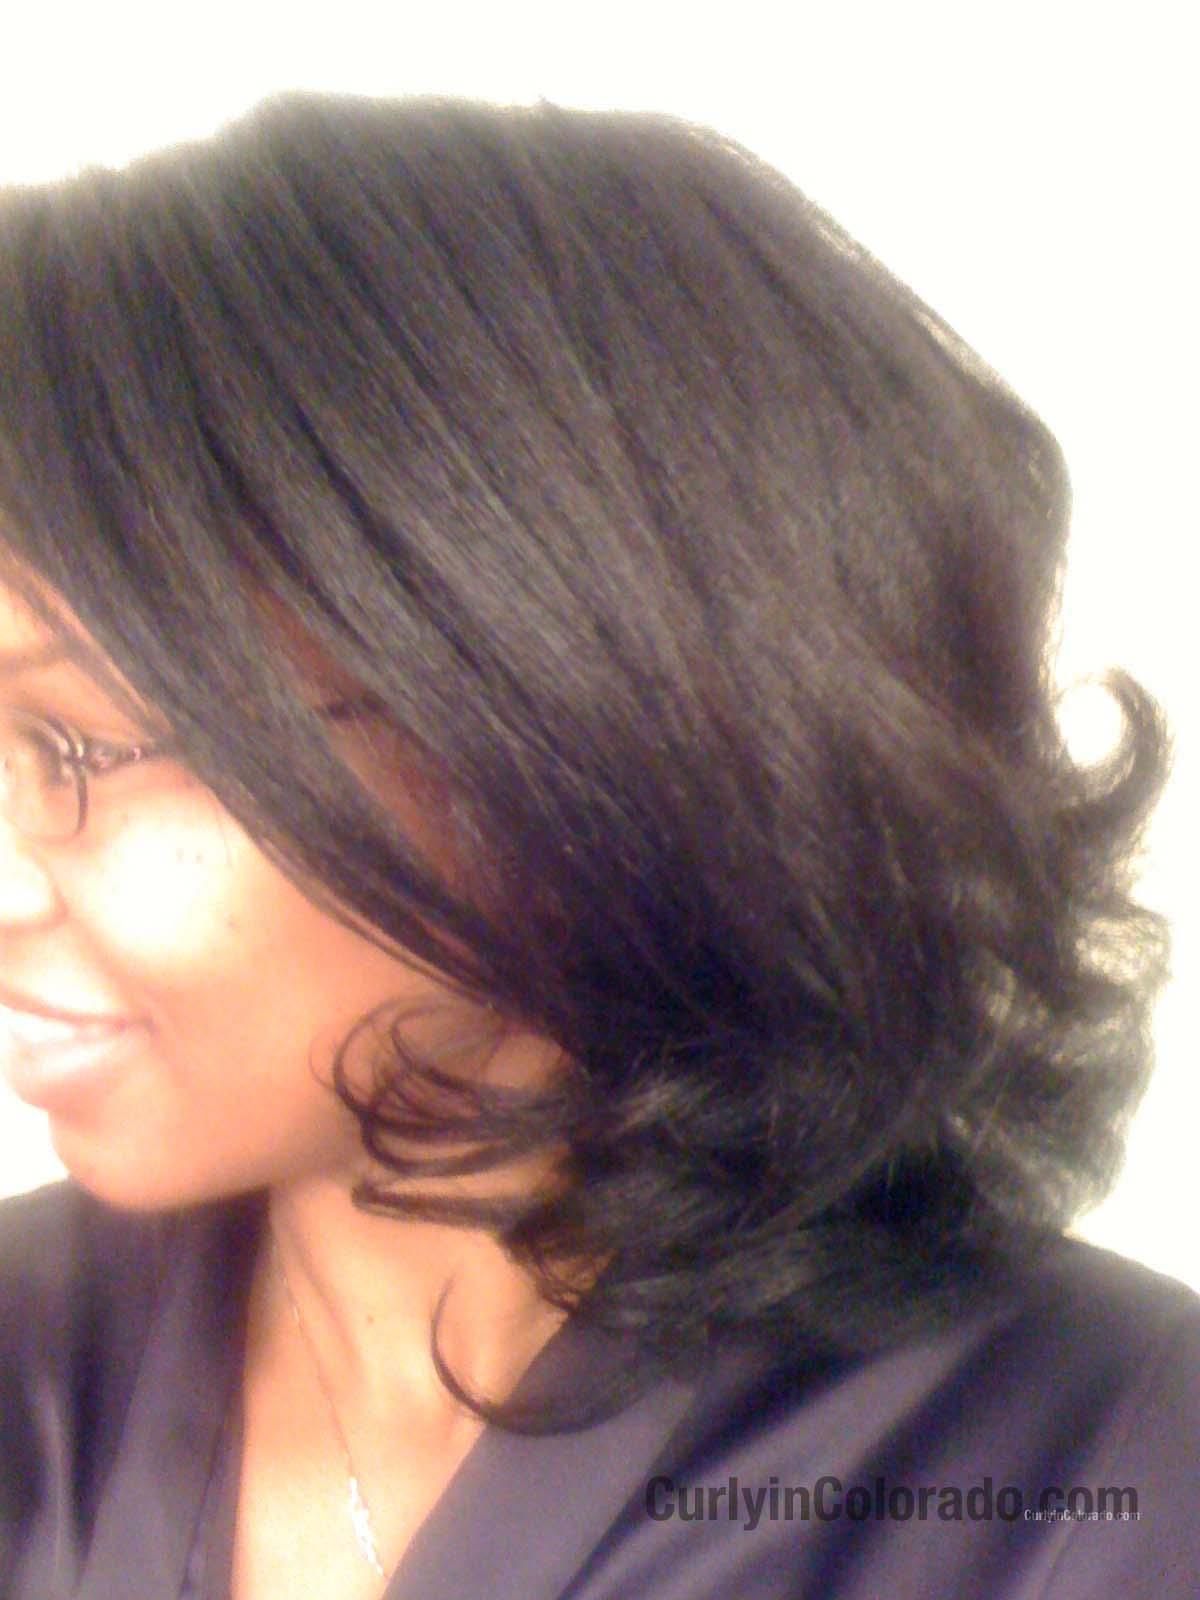 dorothy hairstyle : Doobie Hair http://palmablanca.mx/img/doobie-wrap